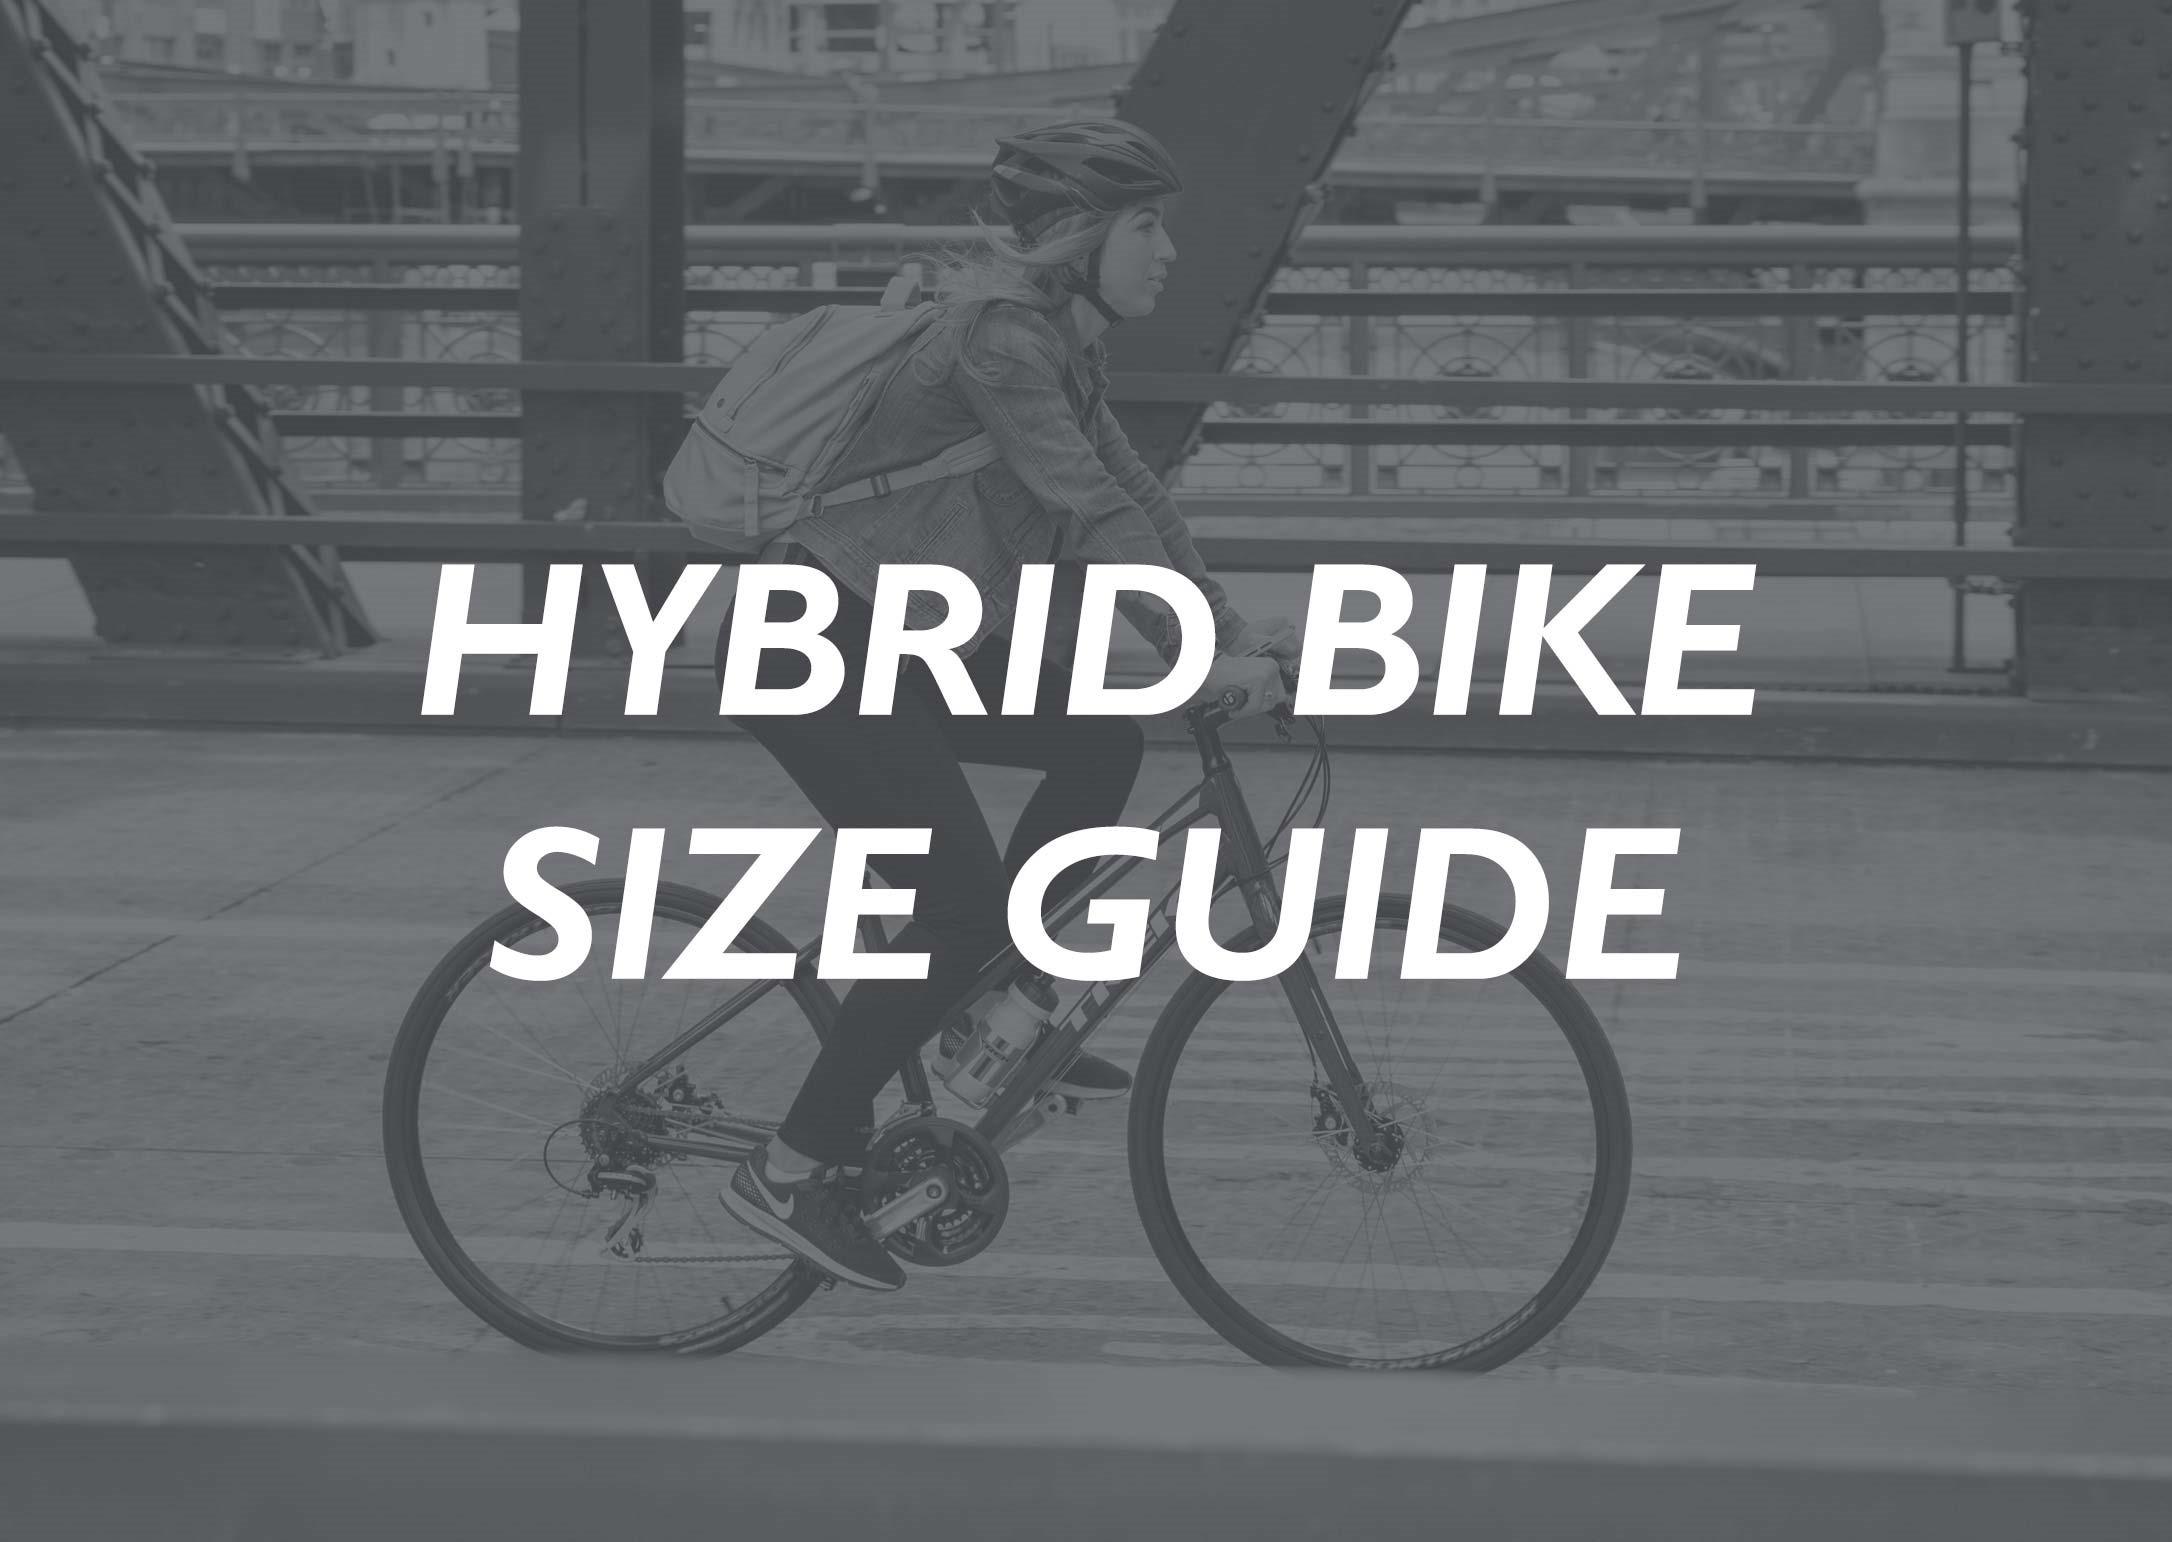 hybrid-size-guide-tile